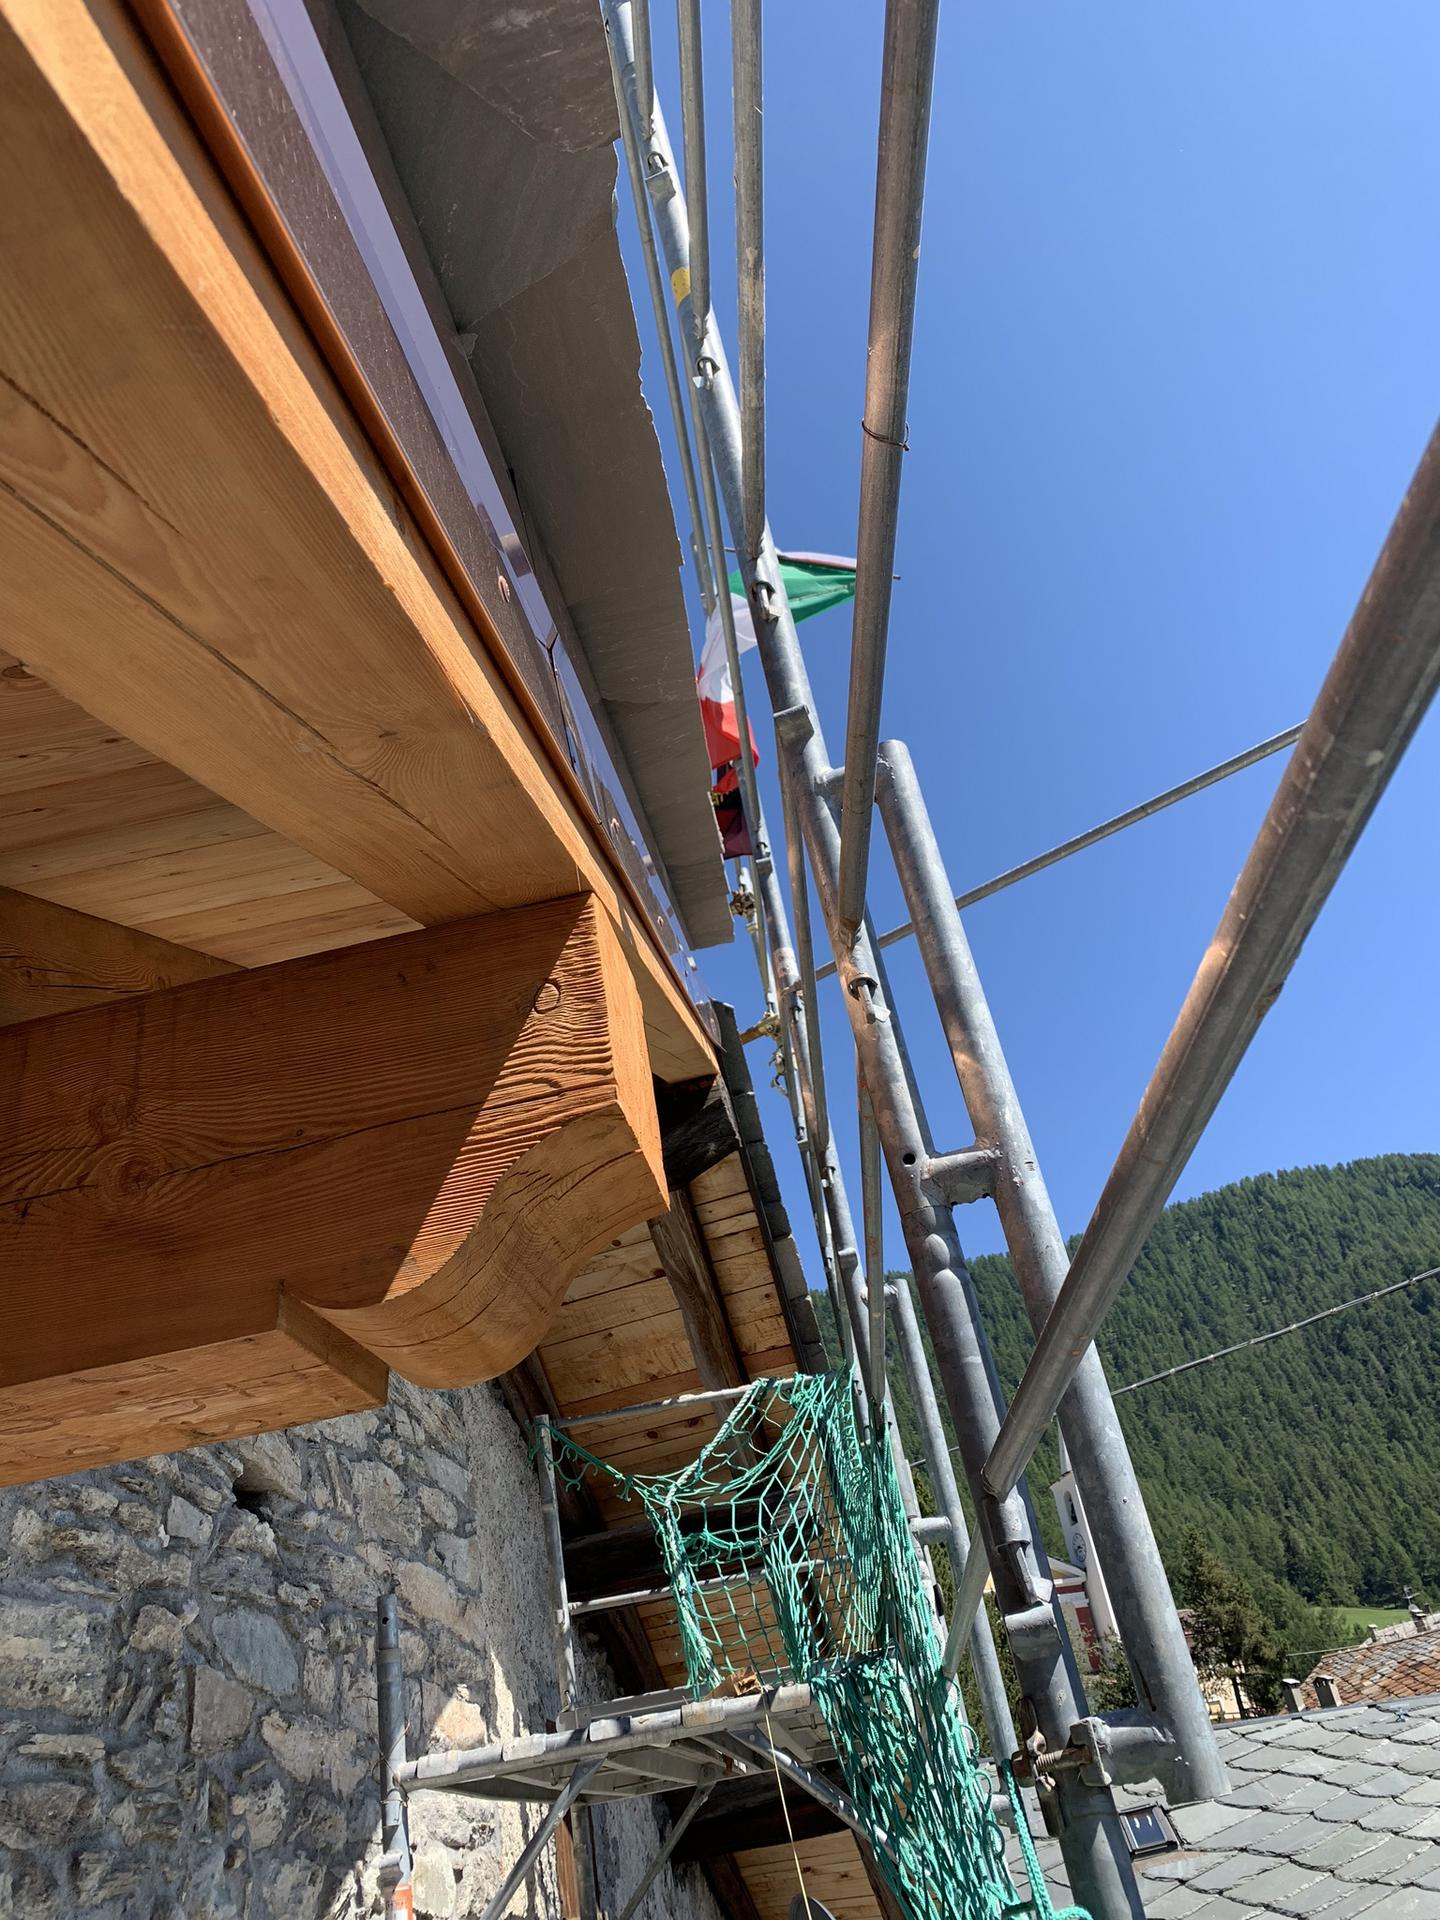 Horsky domcurik - Urady su prisne (aspon na nas), balkony (Hlbka)nesmu presiahnut strechu..to ze ma sused balkony o 30cm precnievajuce to asi nevadi..